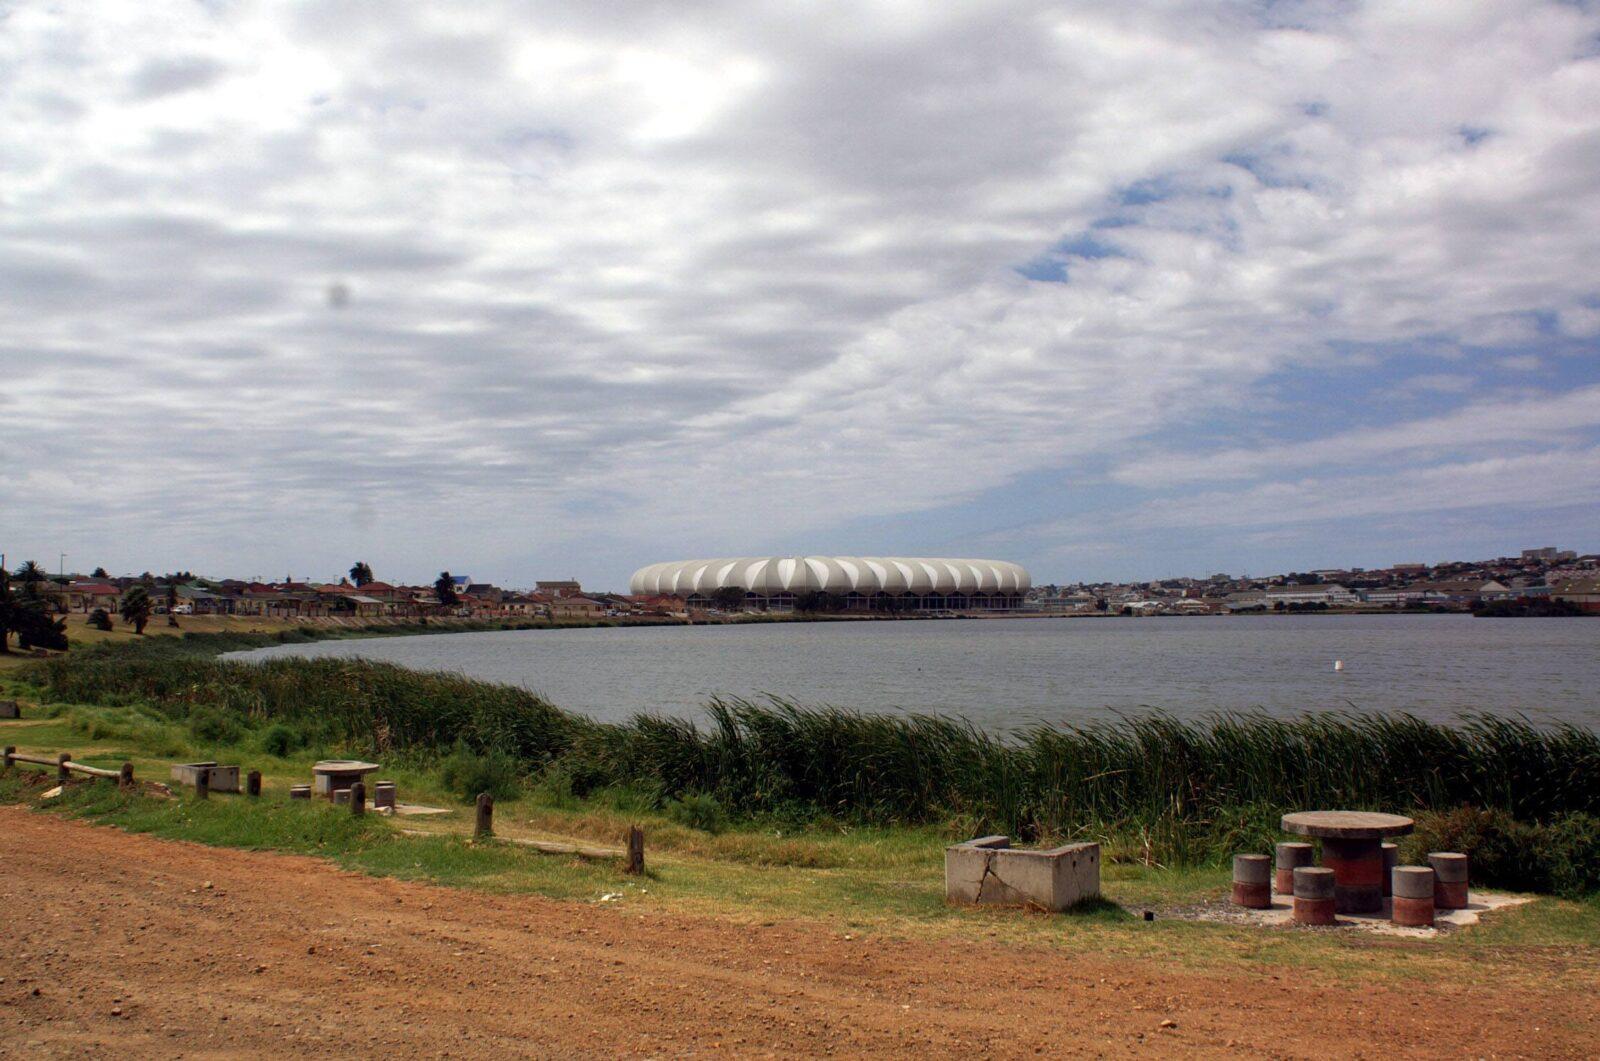 Umgebung des WM Fussballstadions in Port Elizabeth